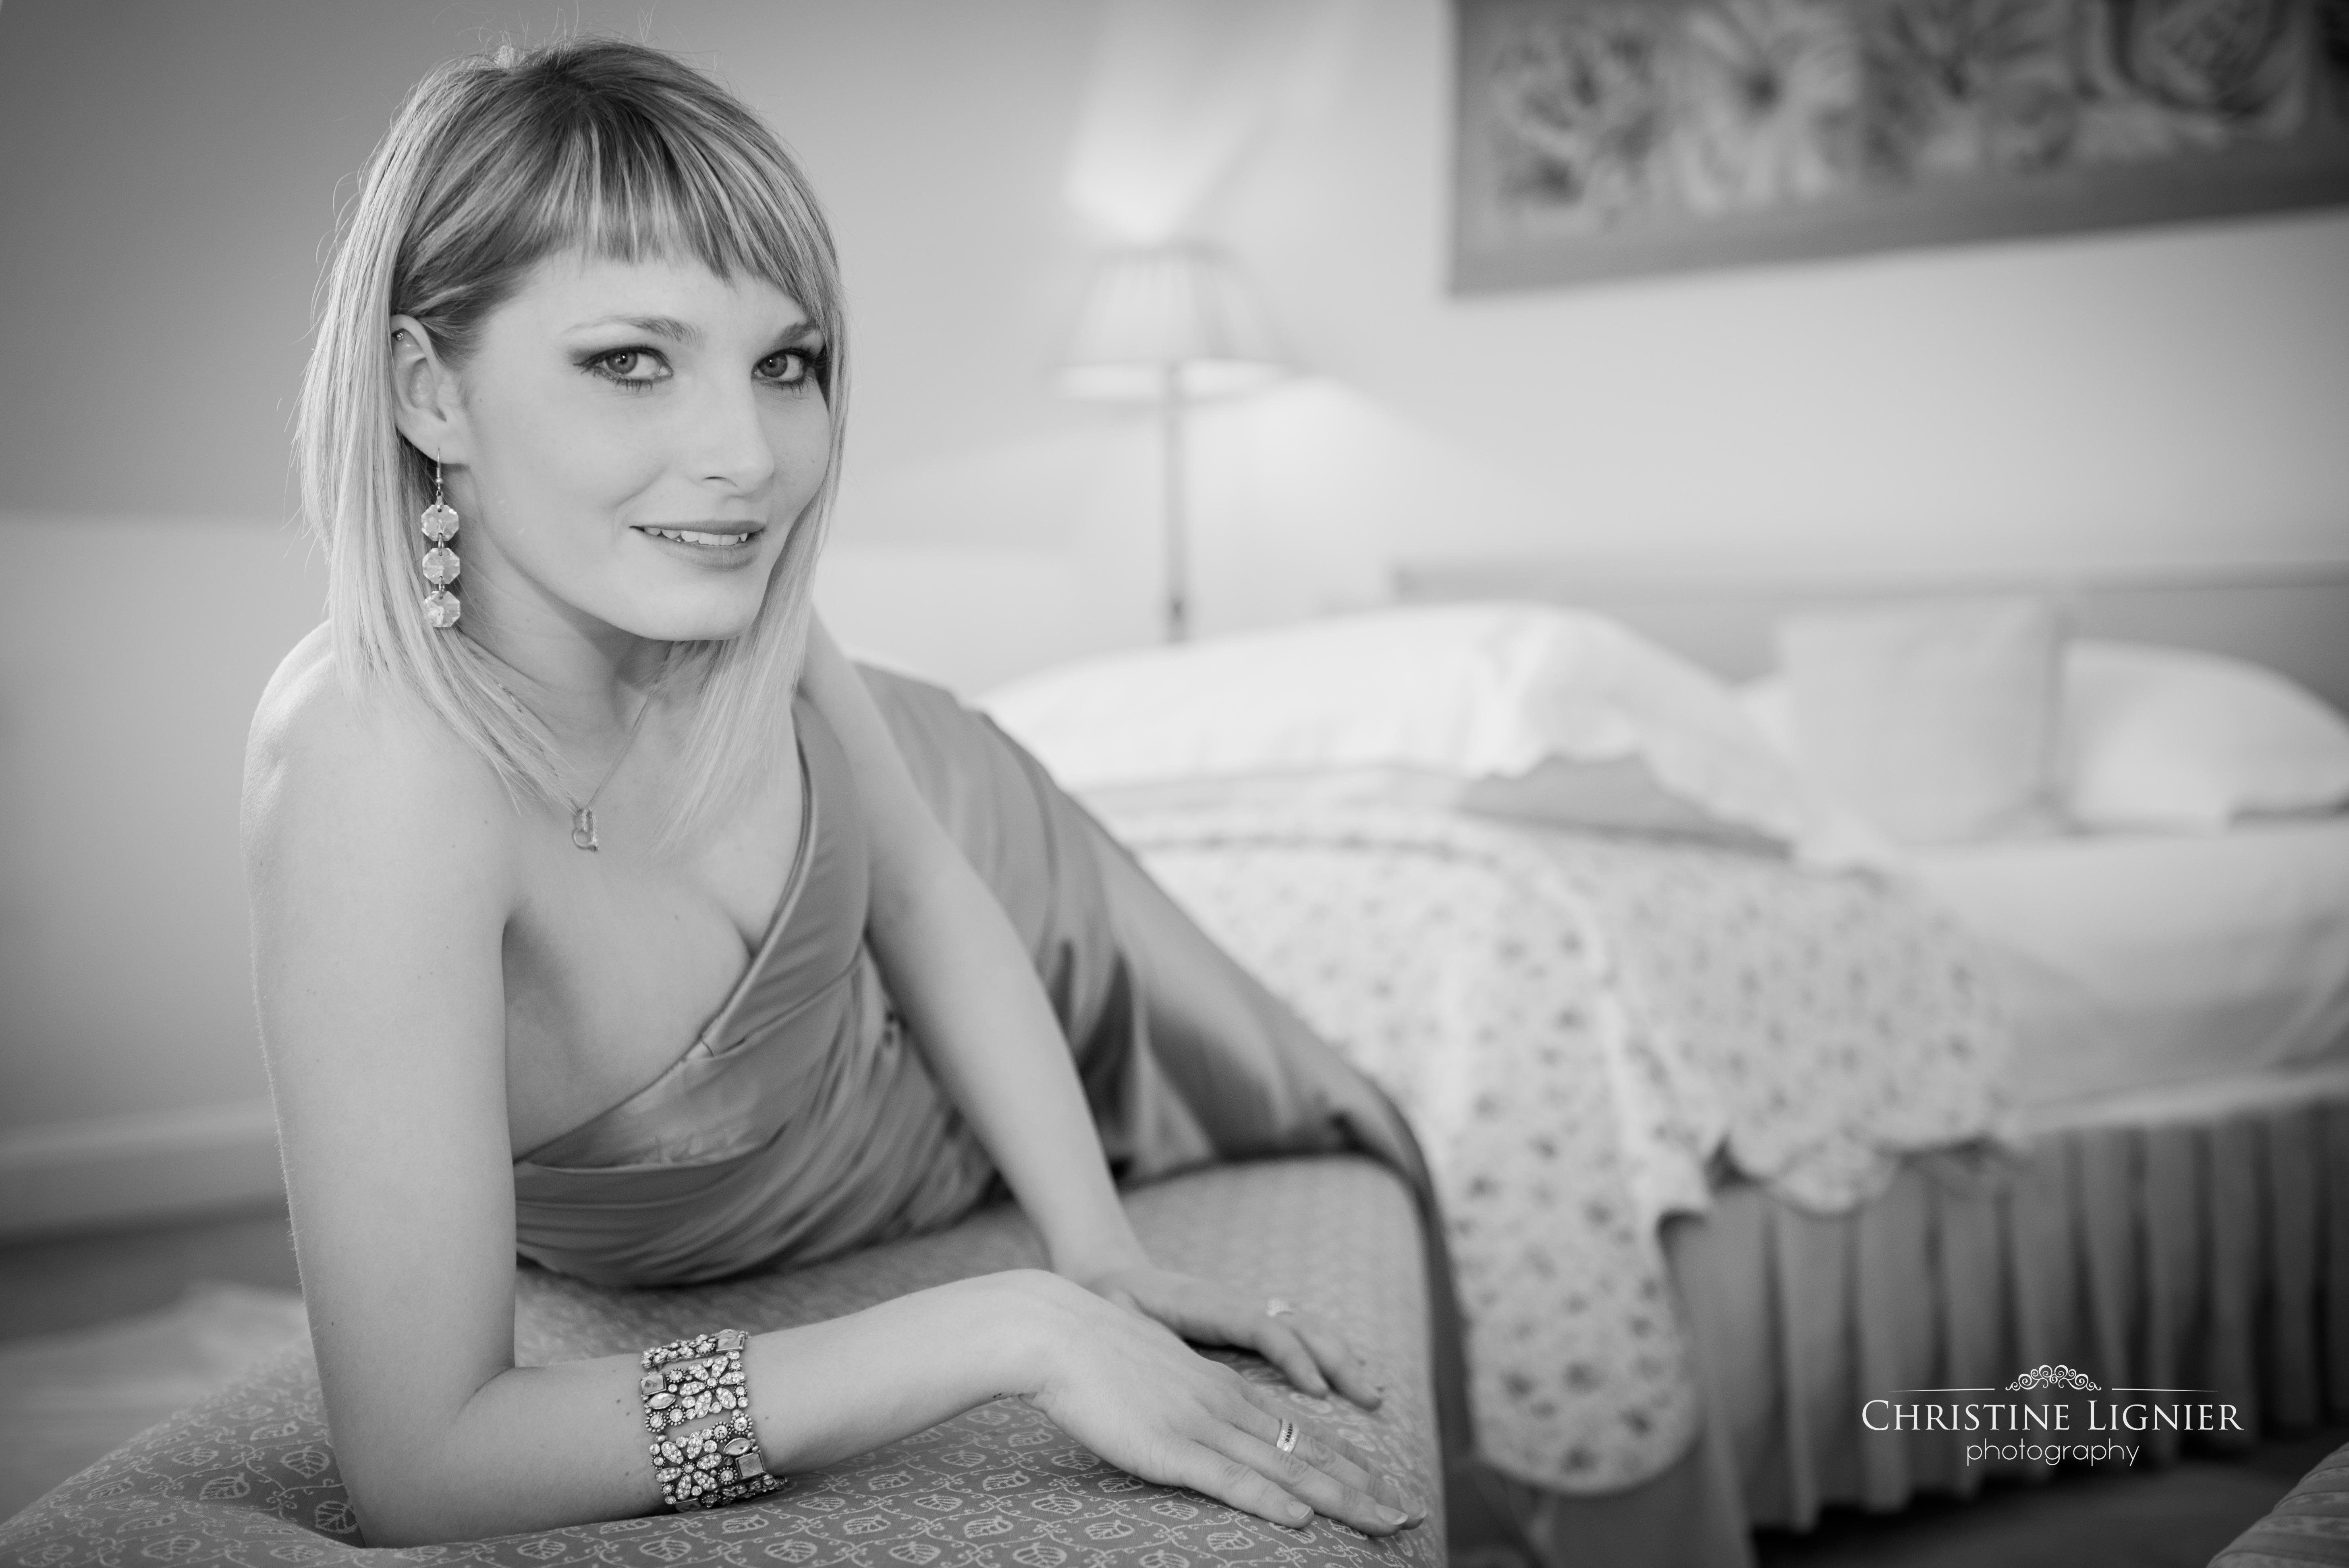 Clémence_-_Christine_Lignier_Photography_(17_sur_32).jpg